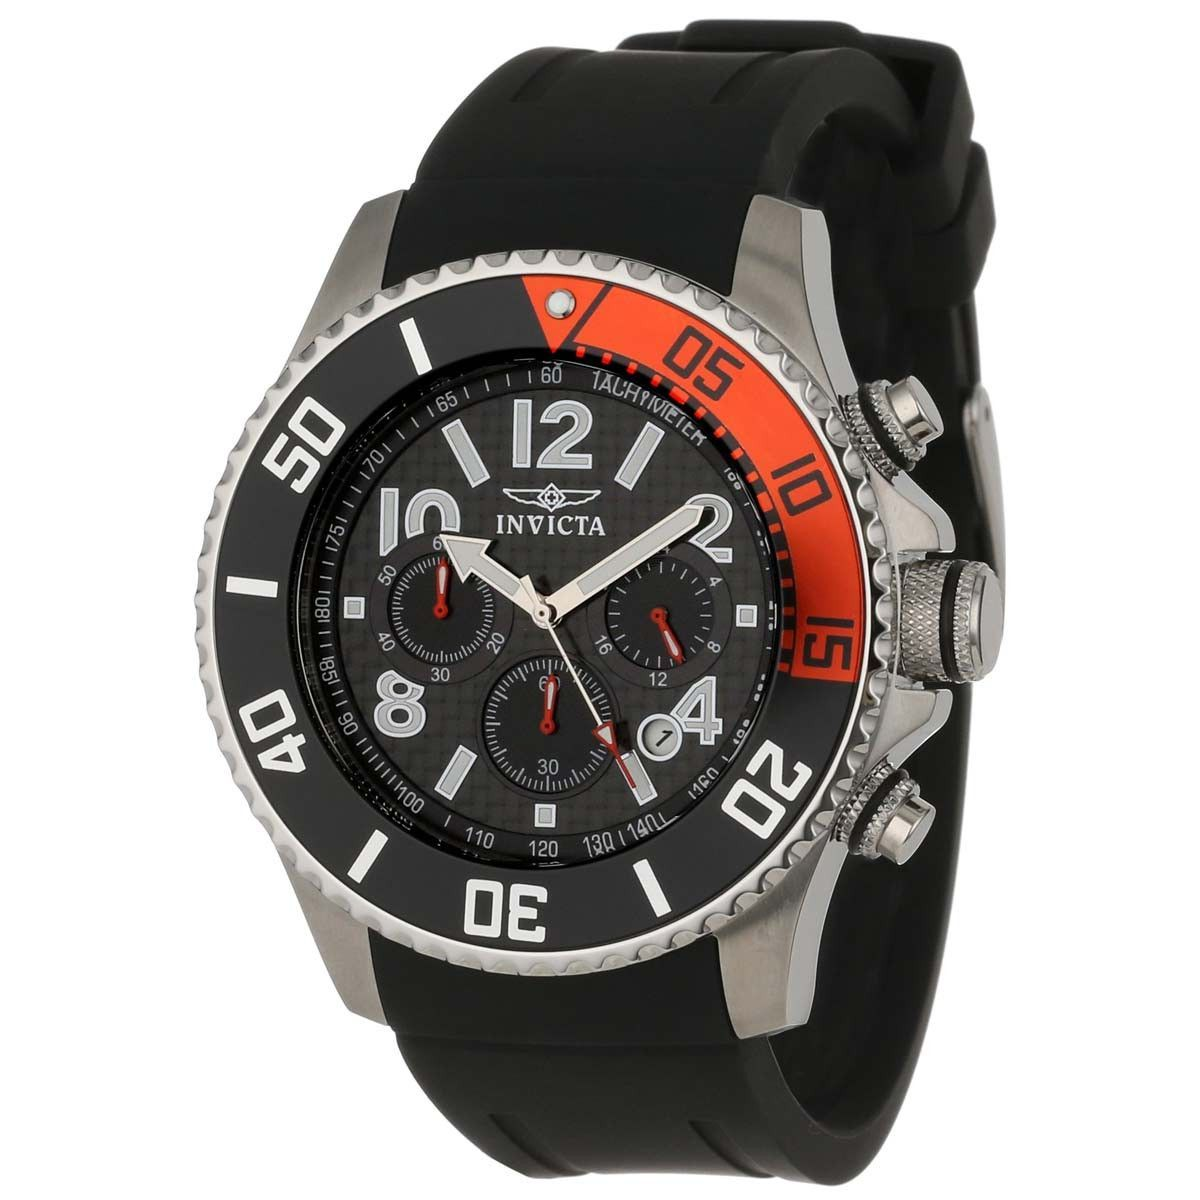 Invicta 13727 Men's Pro Diver Black & Red Bezel Carbon Fiber Black Dial Chronograph Watch